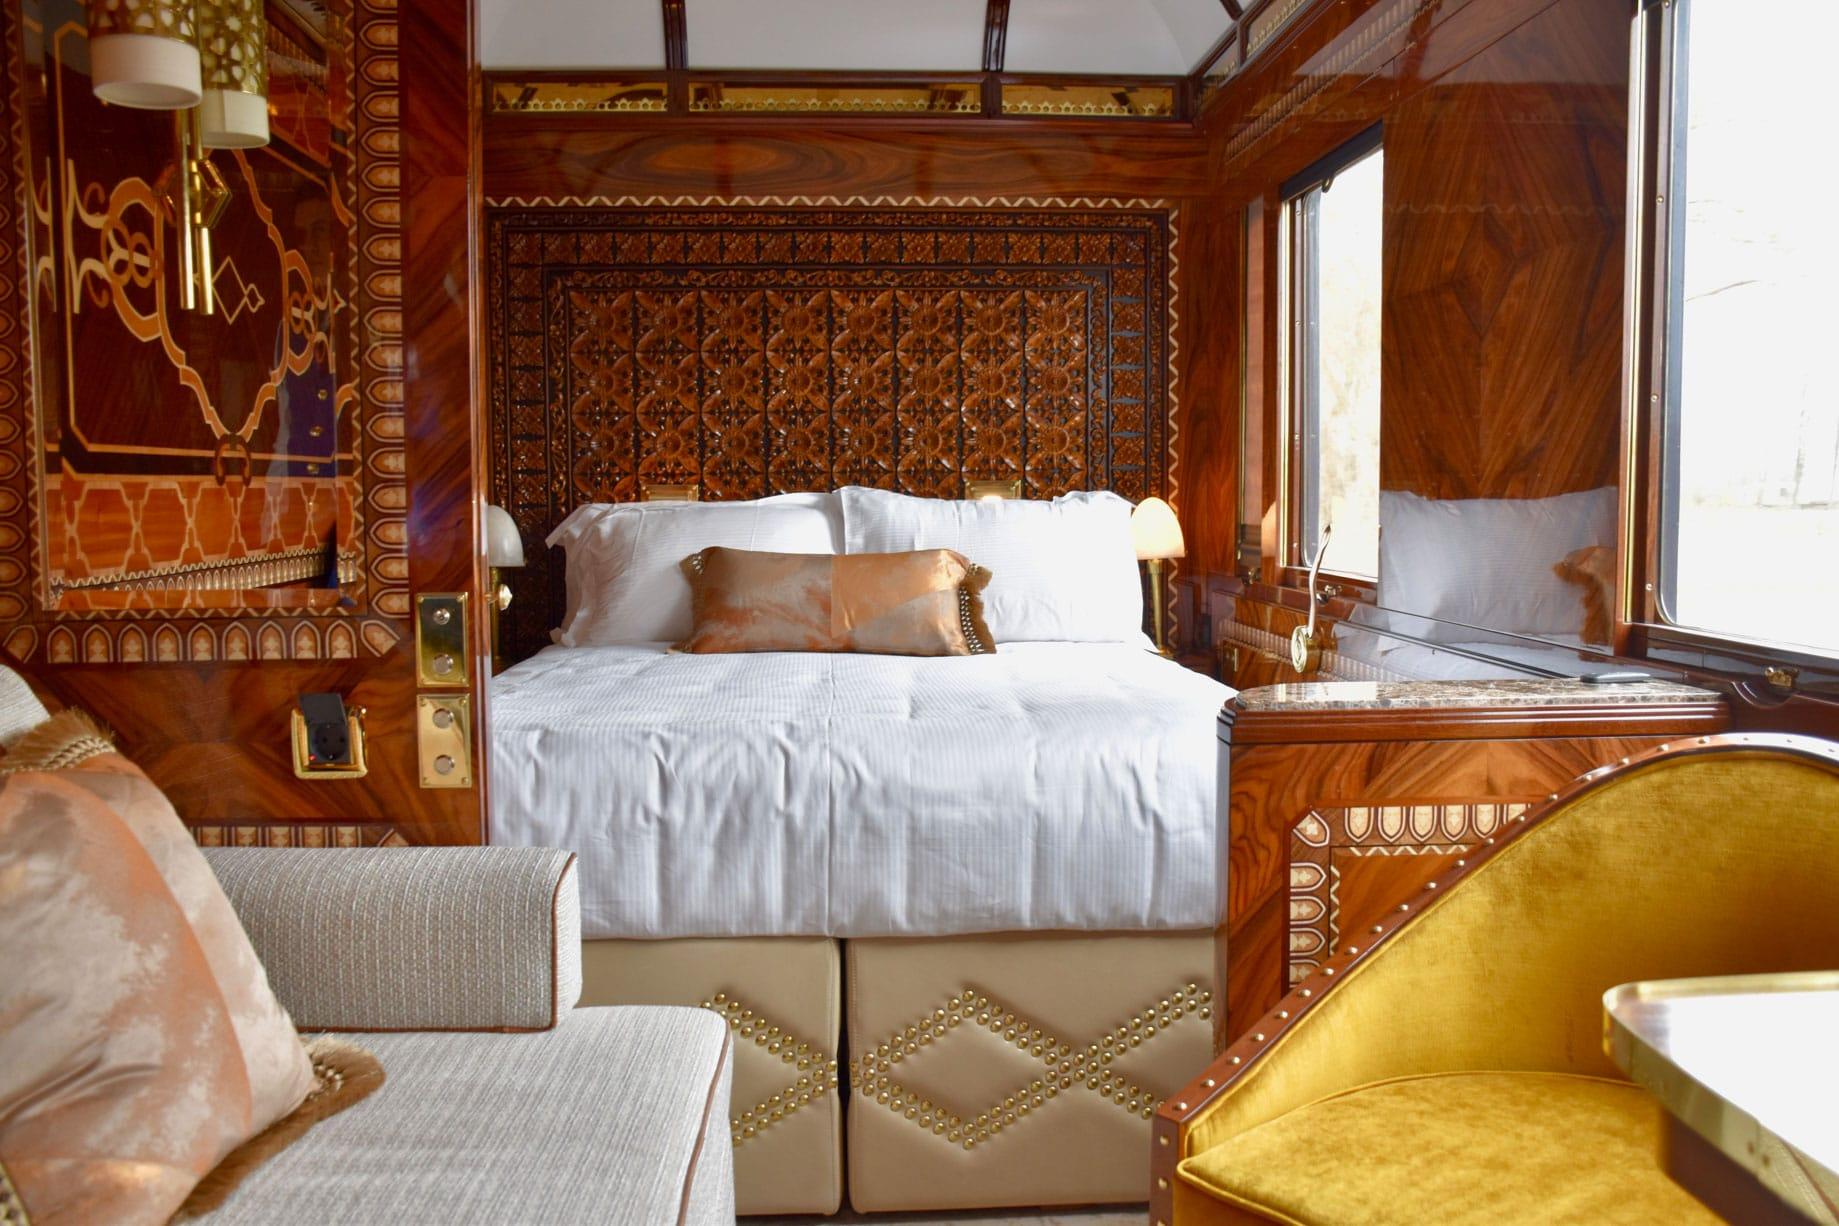 Venice Simplon-Orient-Express (VSOE) bedroom